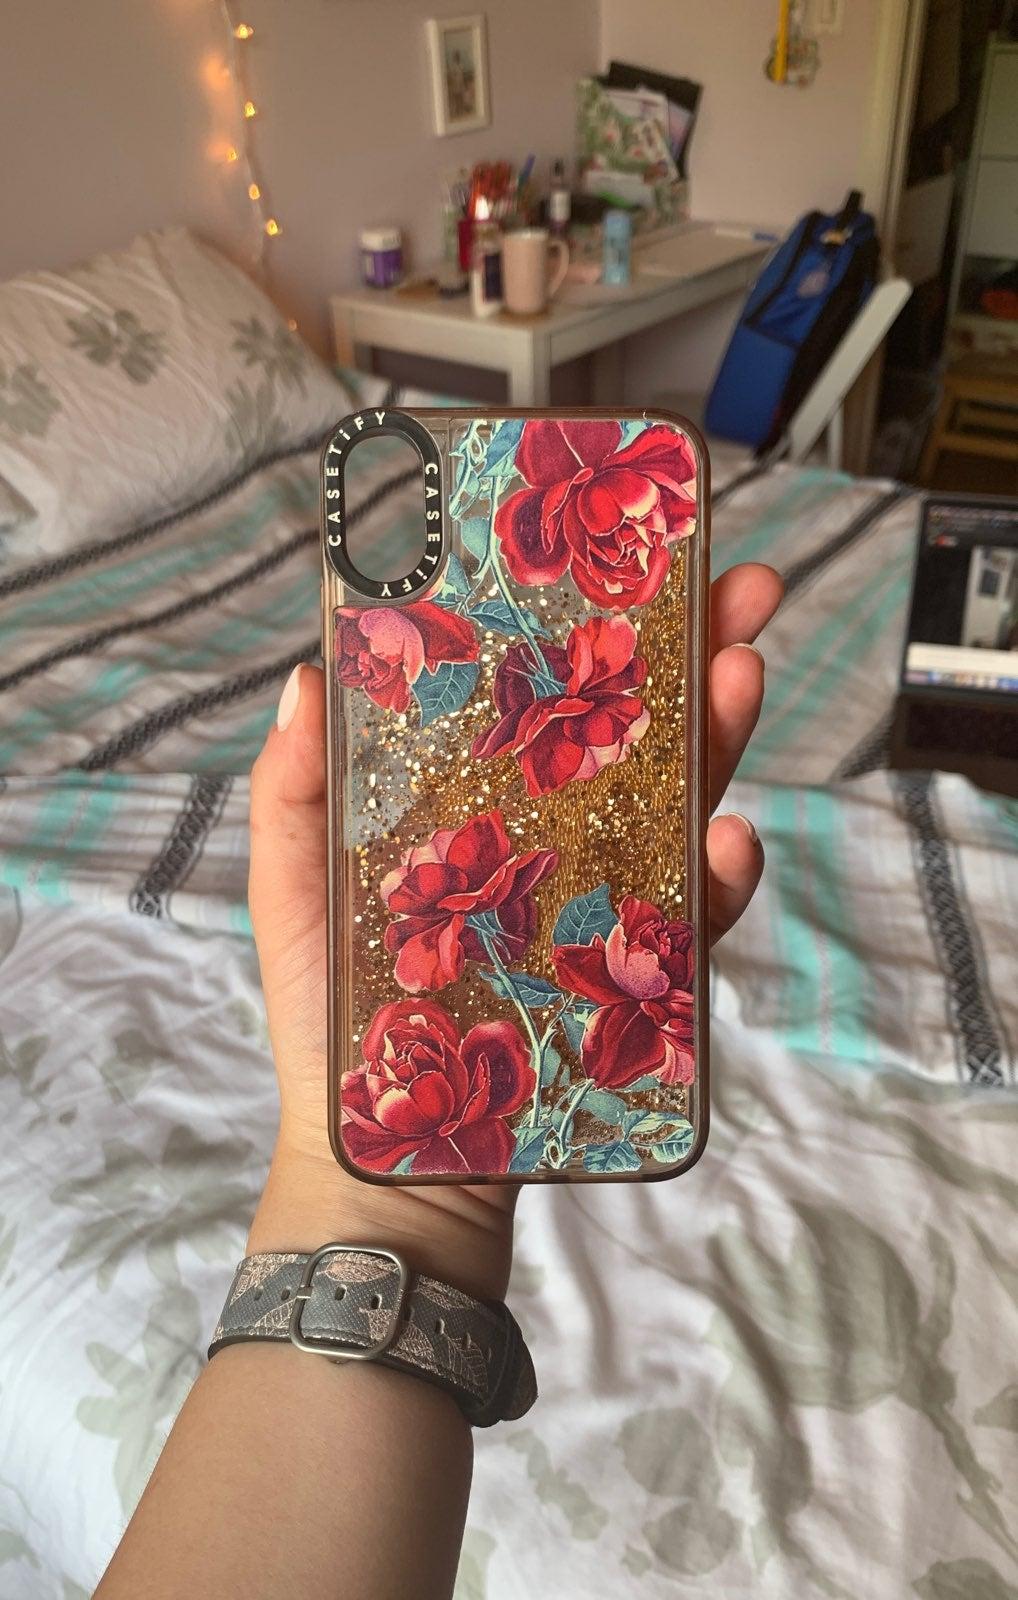 XS Max Gold Glitter Casetify Case